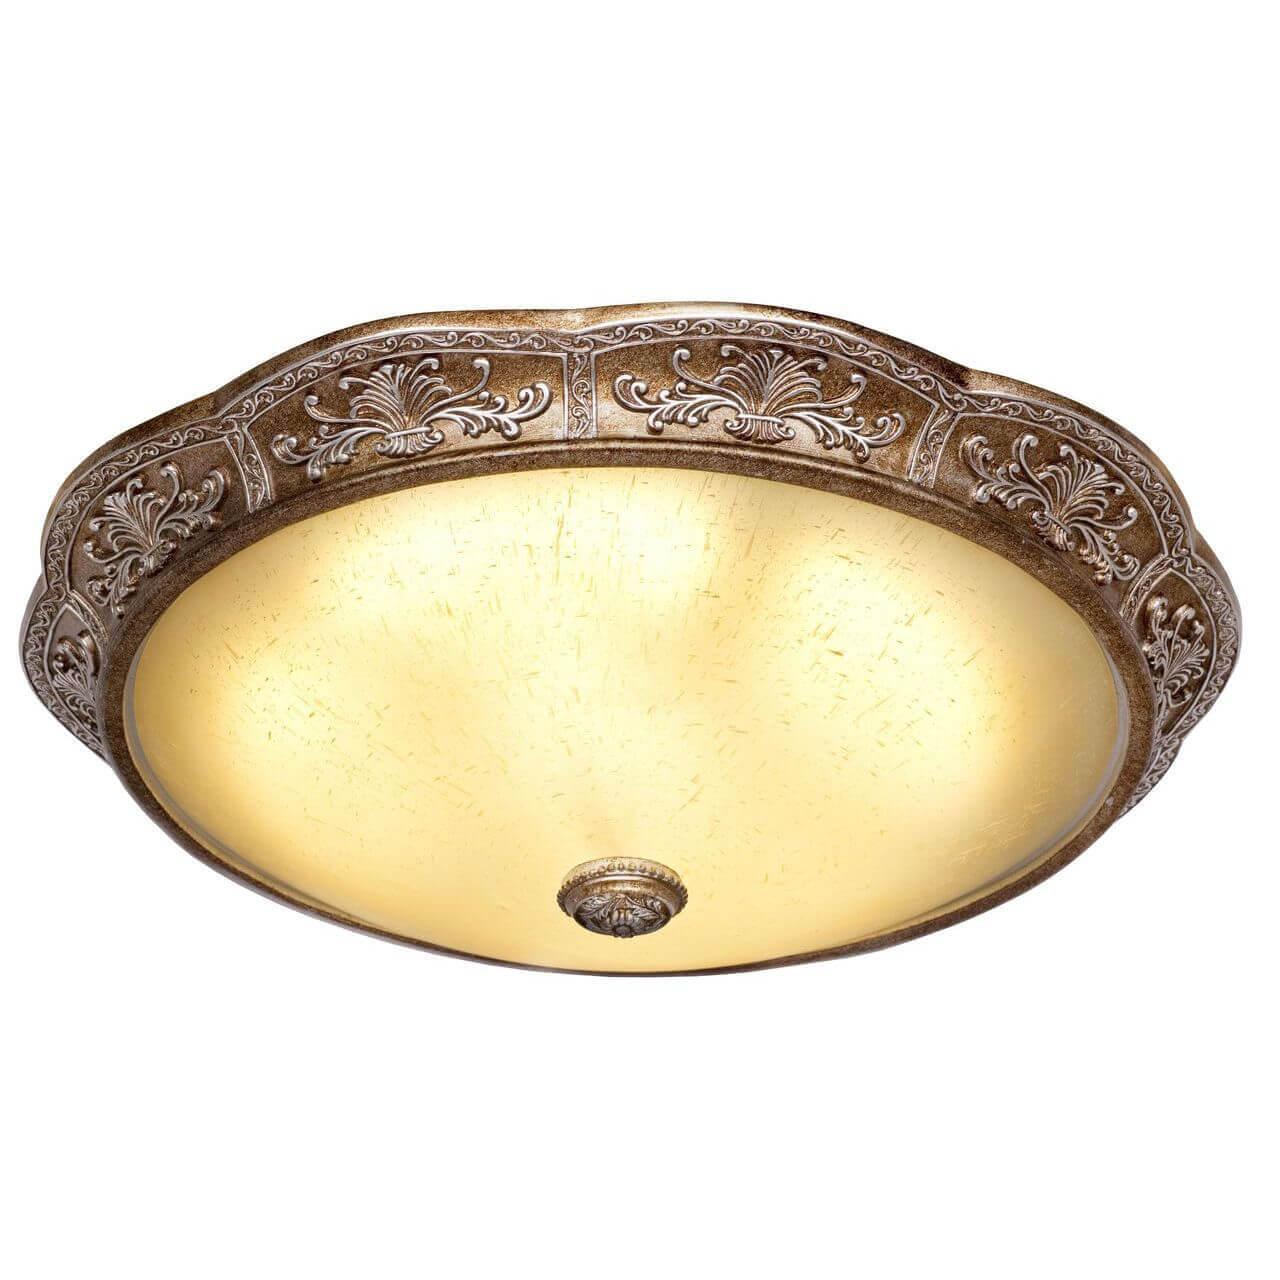 Светильник Silver Light 830.49.7 Louvre Brown Beige настенный светодиодный светильник silver light louvre 844 36 7